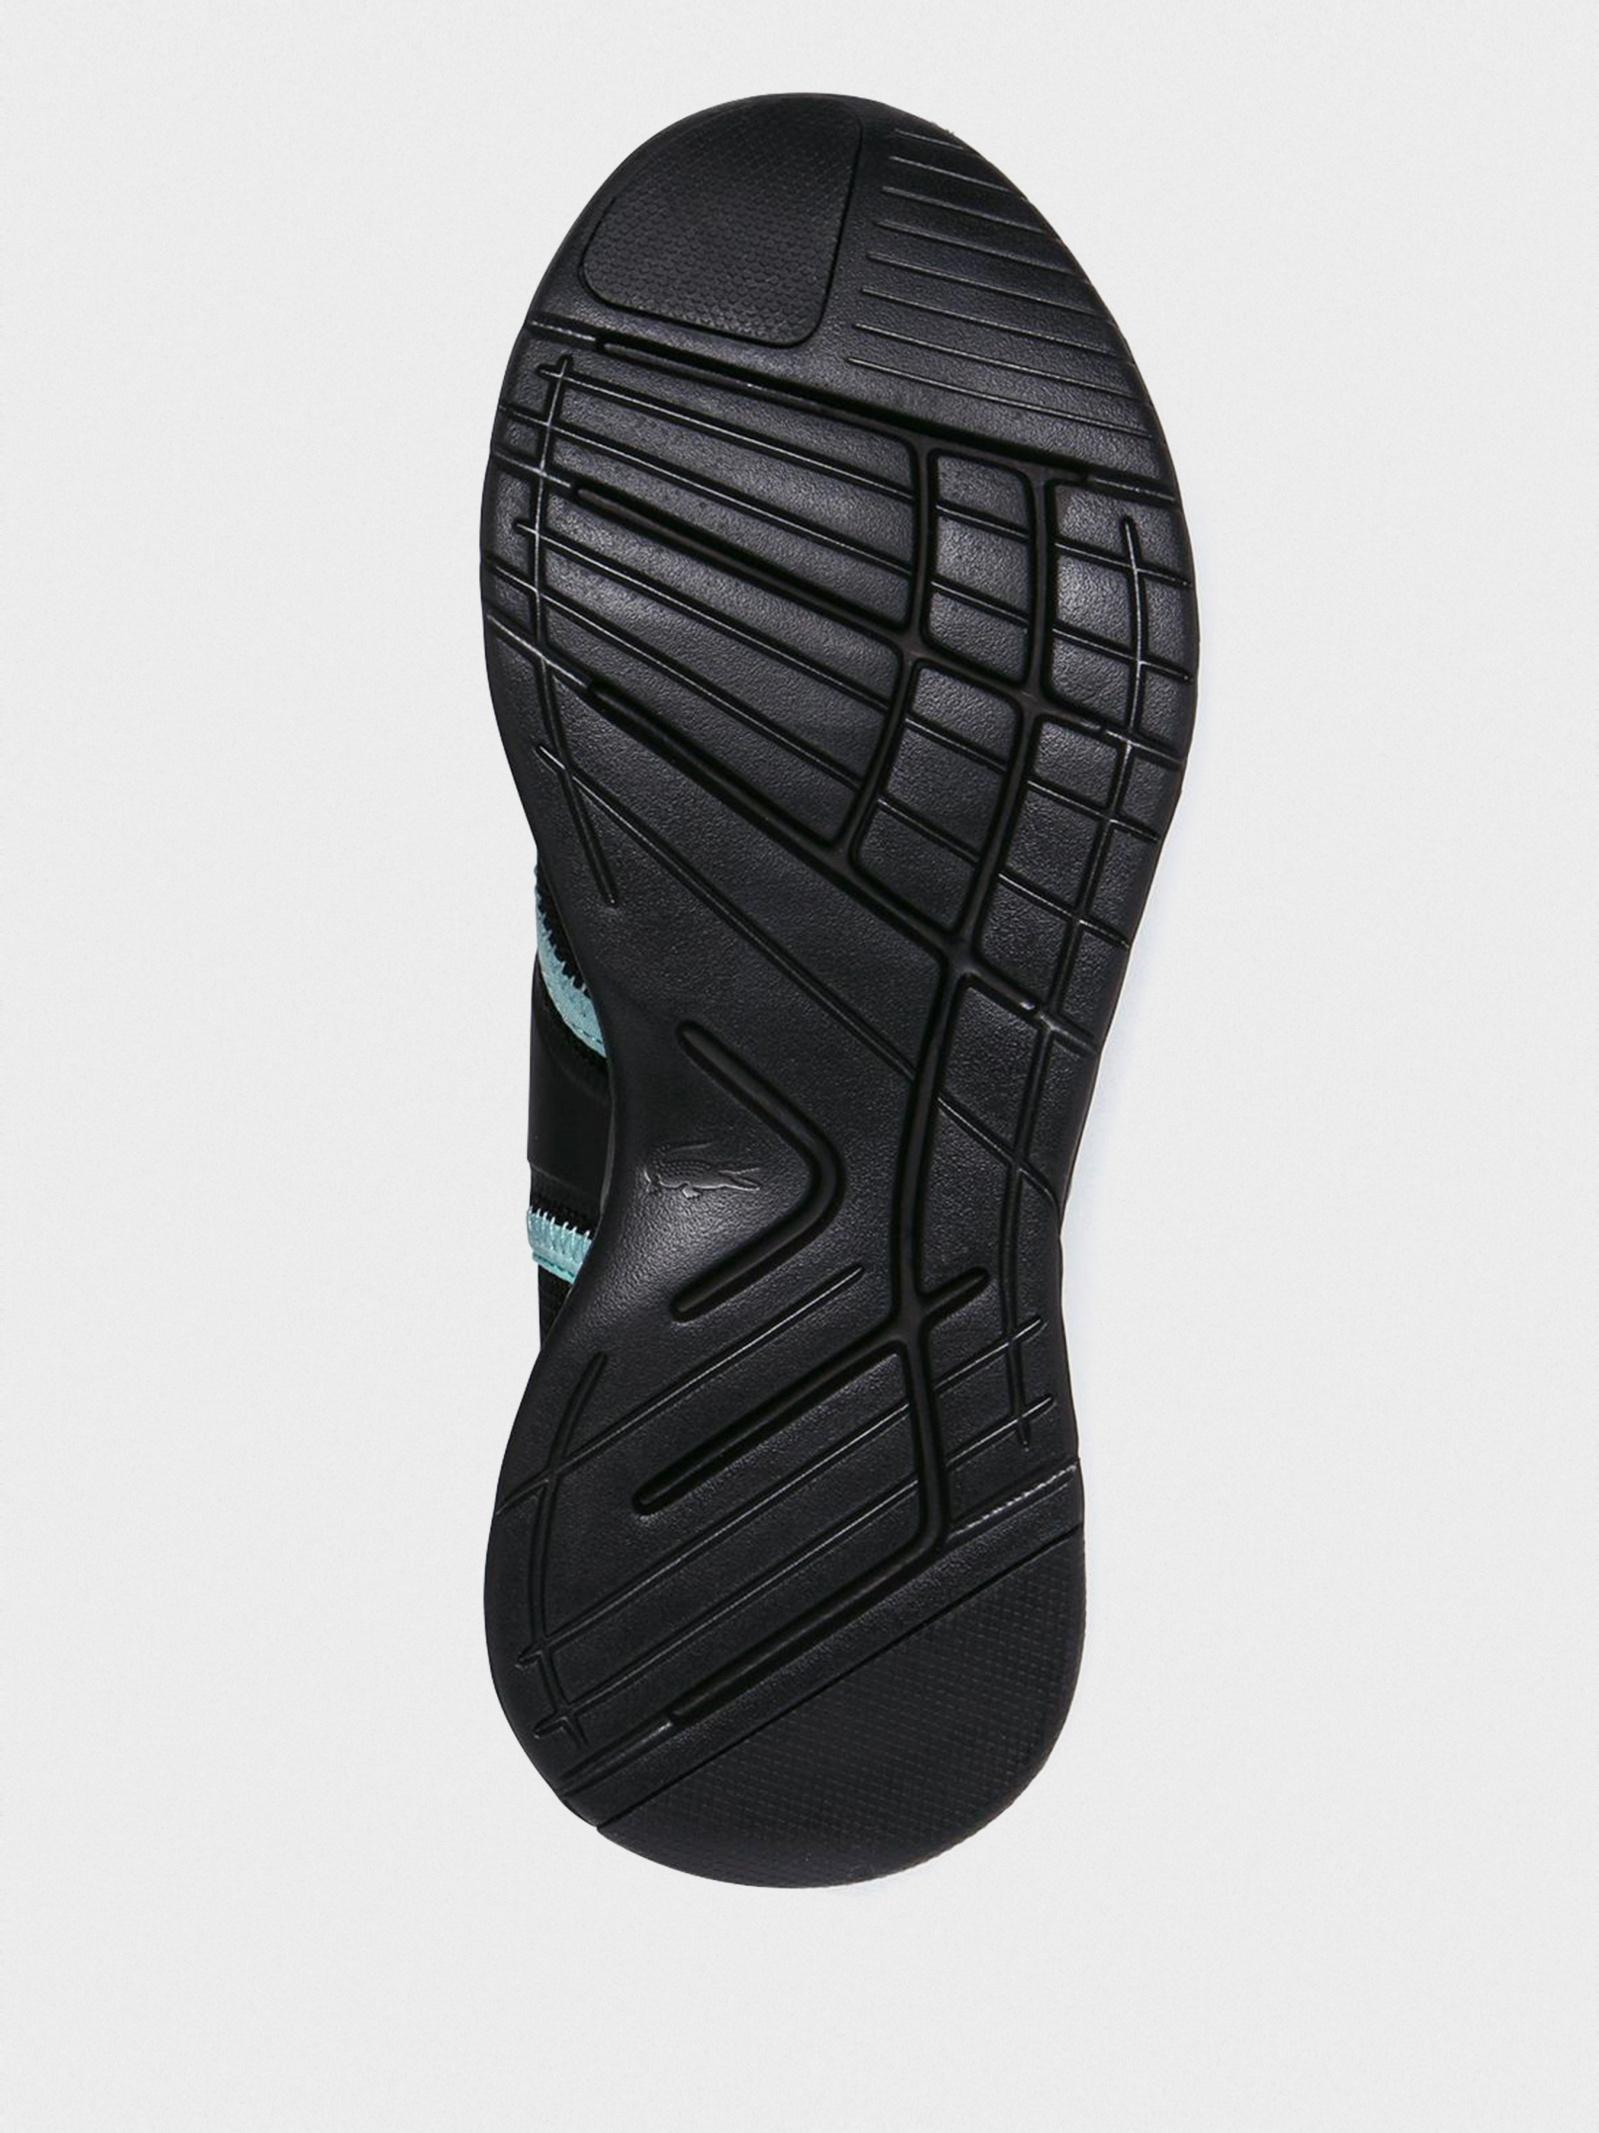 Кросівки  для жінок Lacoste LT FIT NU 120 1 SFA 739SFA00372J9 примірка, 2017